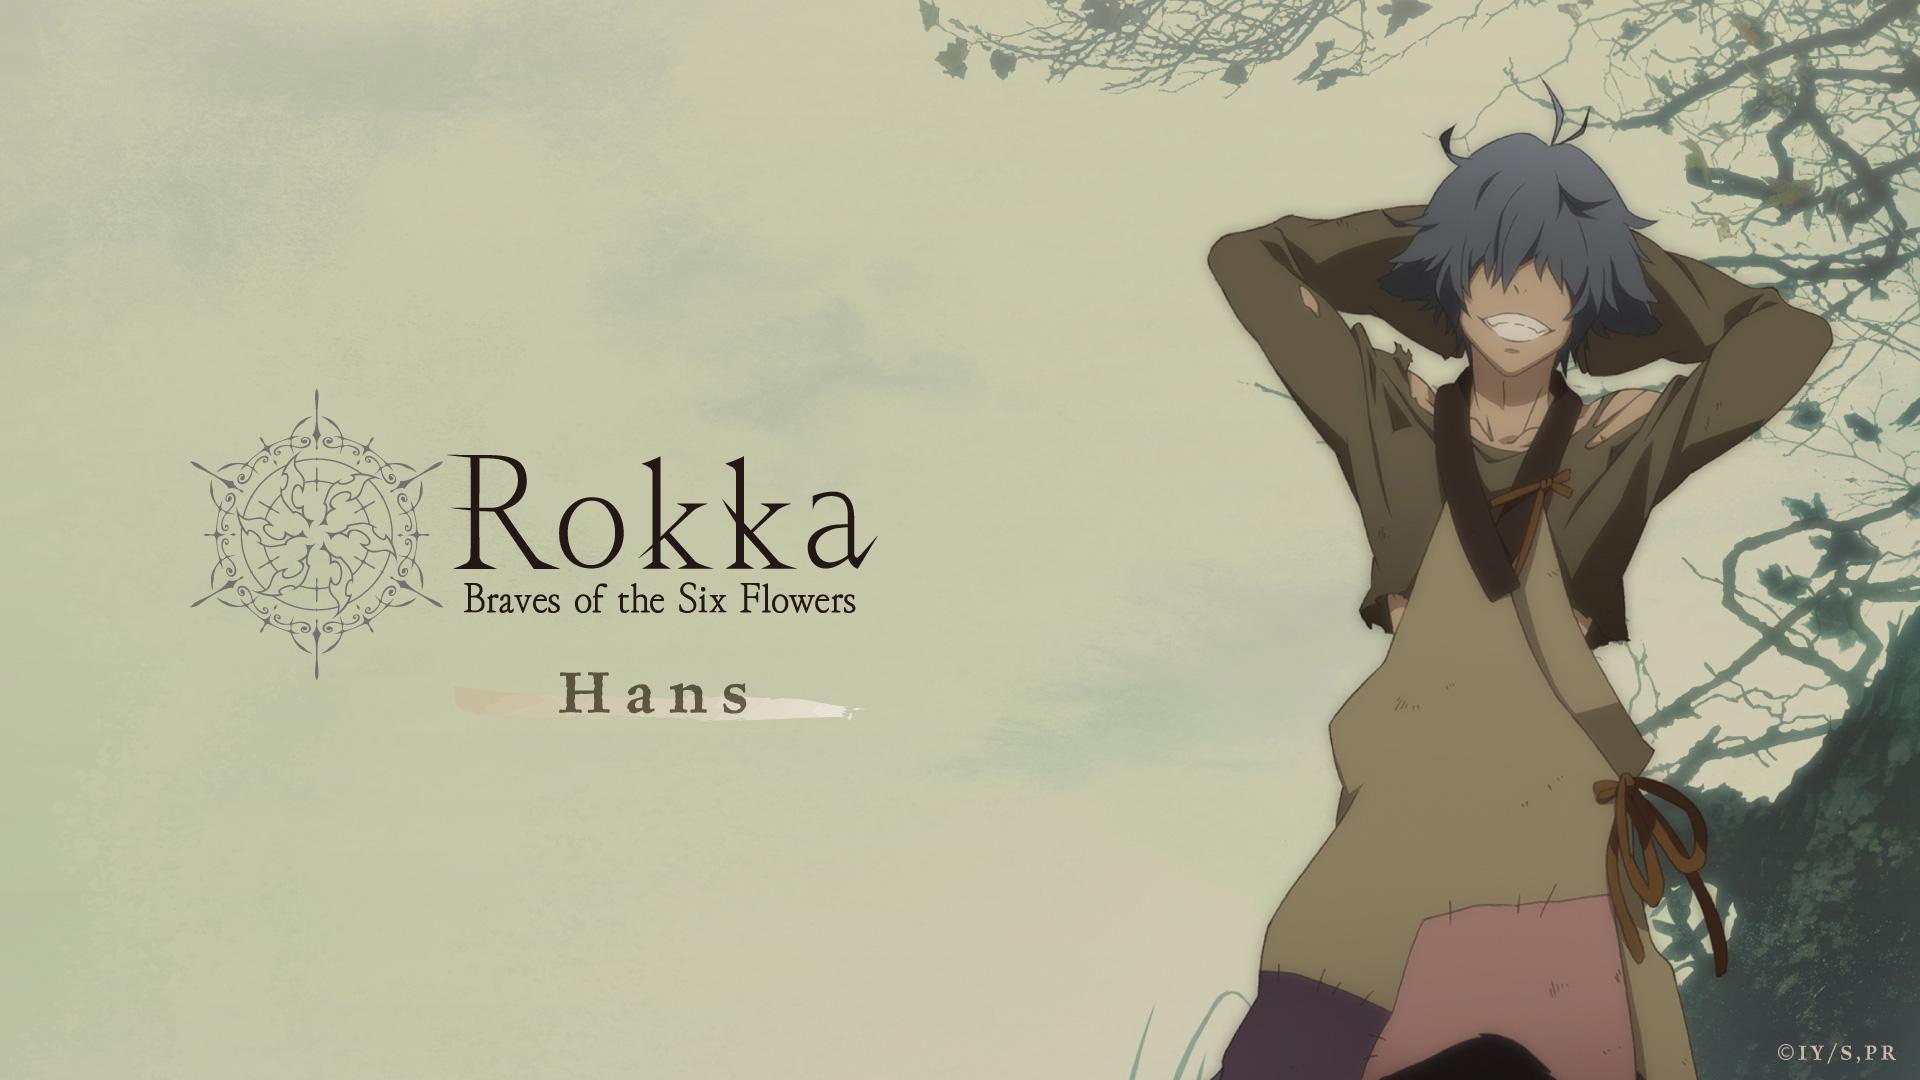 Rokka-no-Yuusha-Anime-Wallpaper-Hans-Humpty